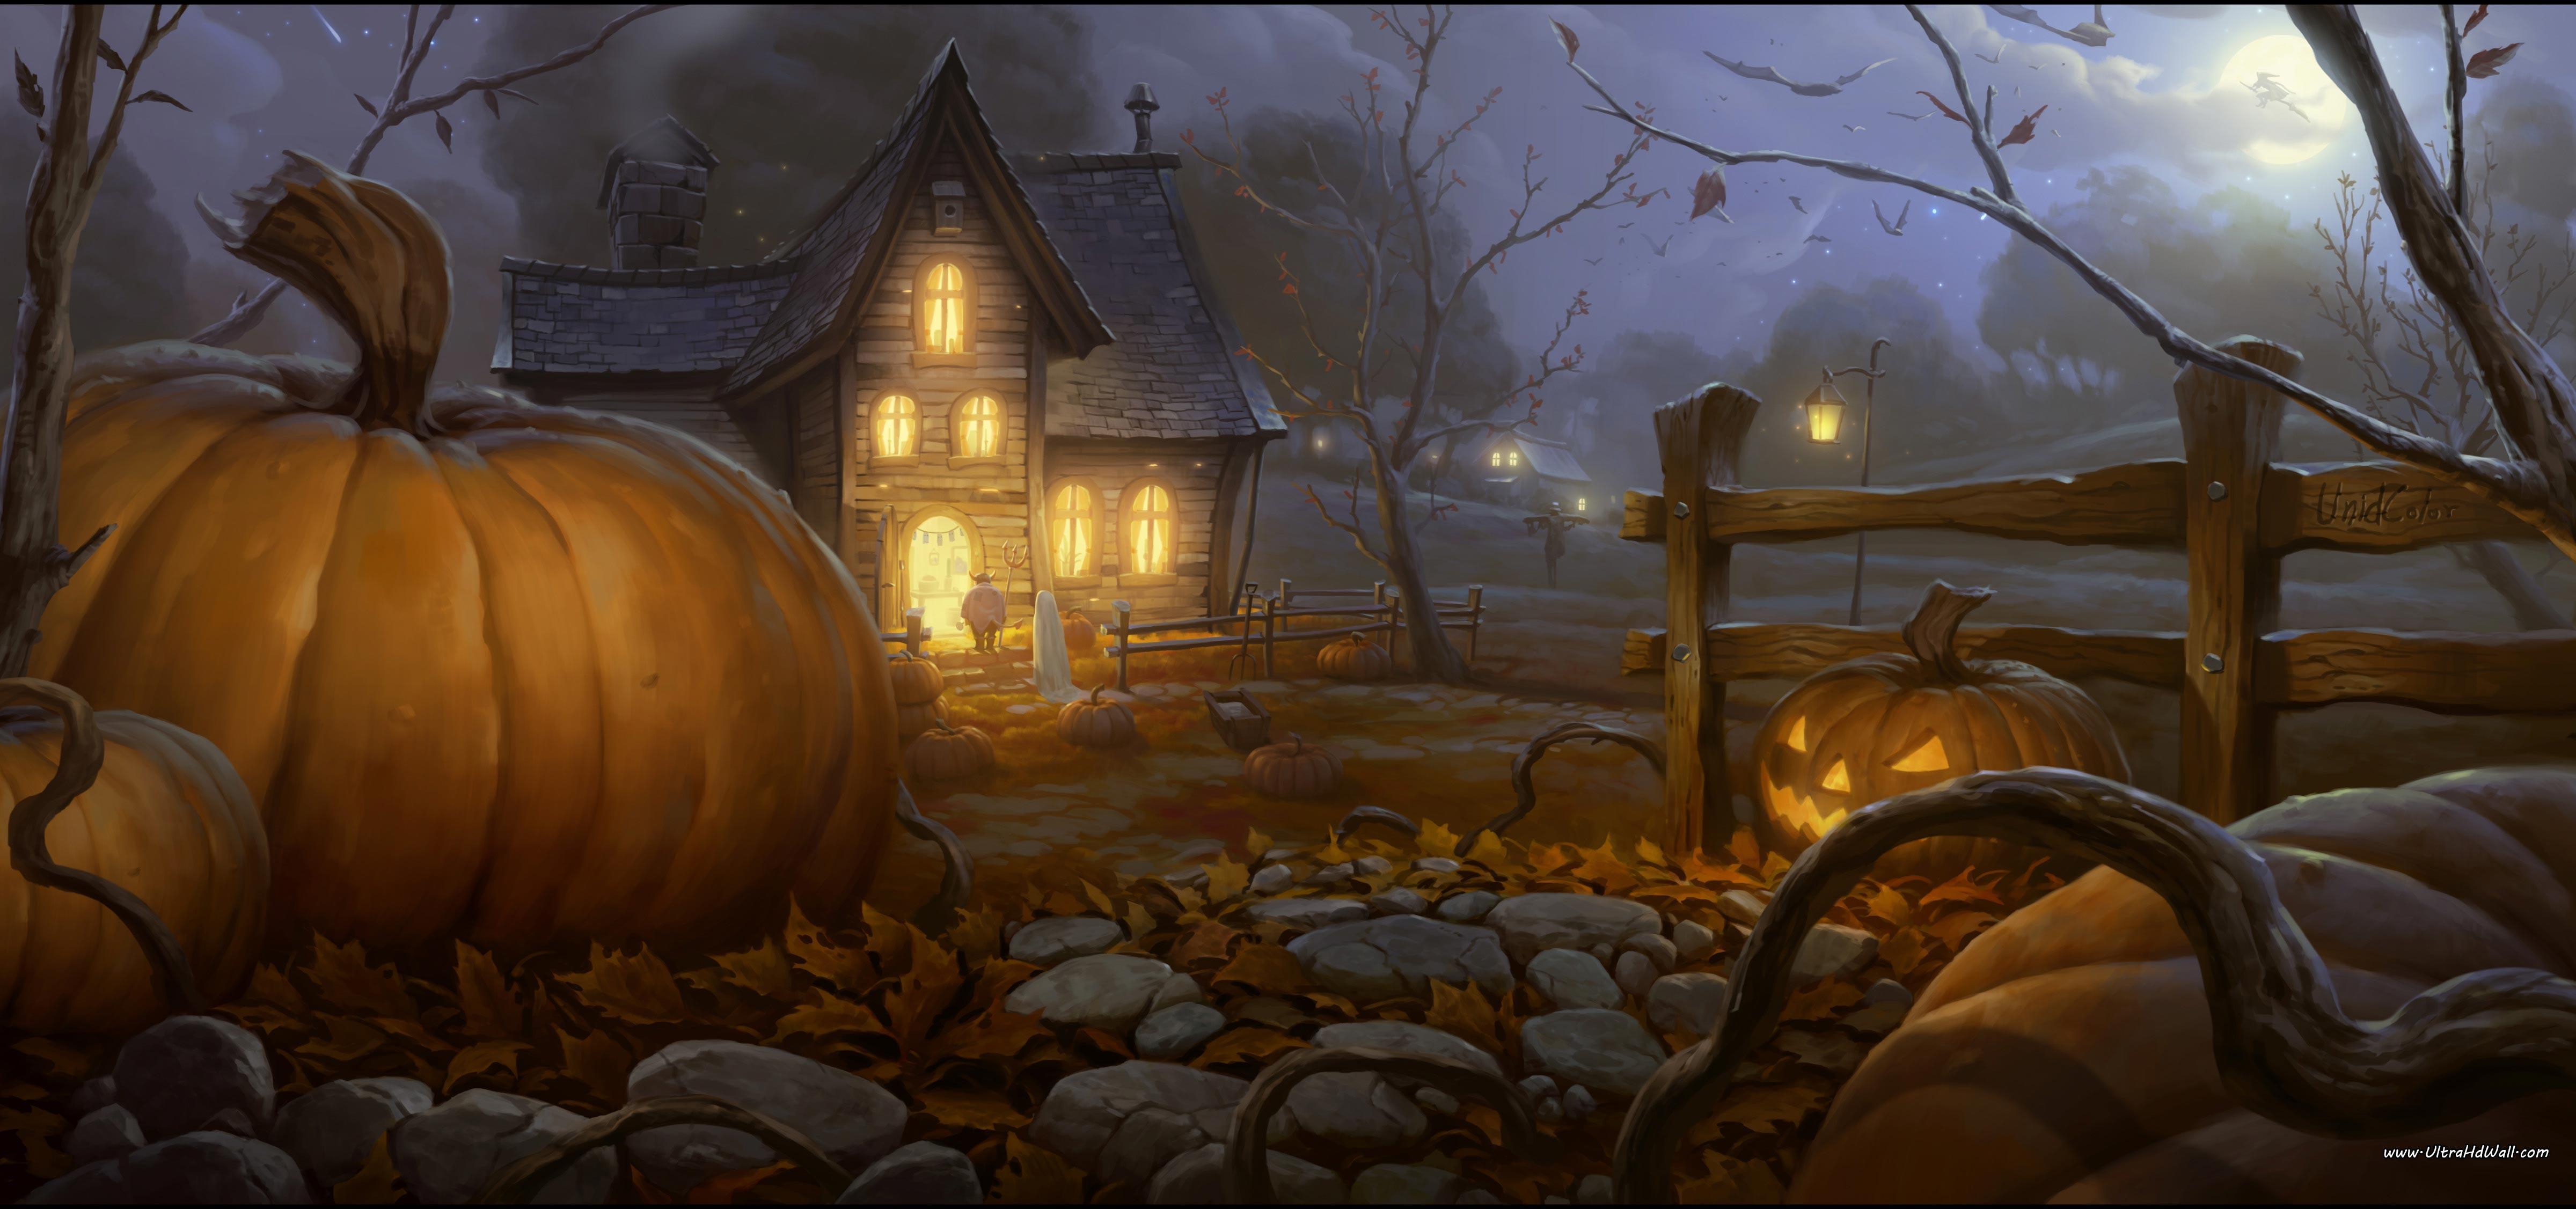 com wallpapers halloween house windows - photo #44